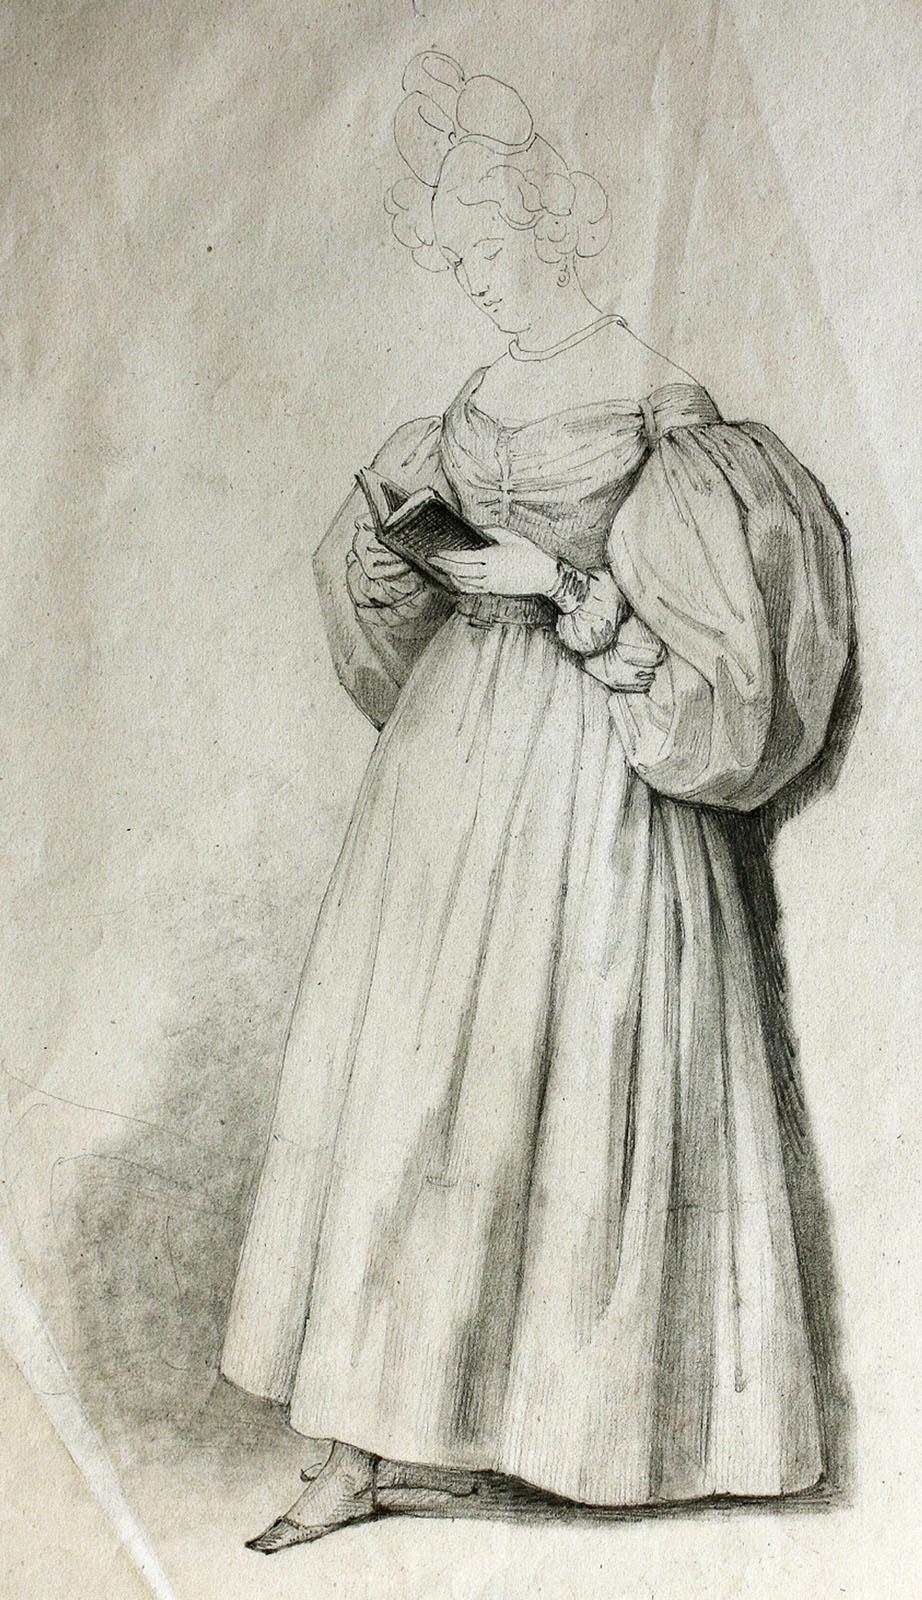 Rosario Weiss Zorrilla. Mujer Leyendo. 1830-1838.